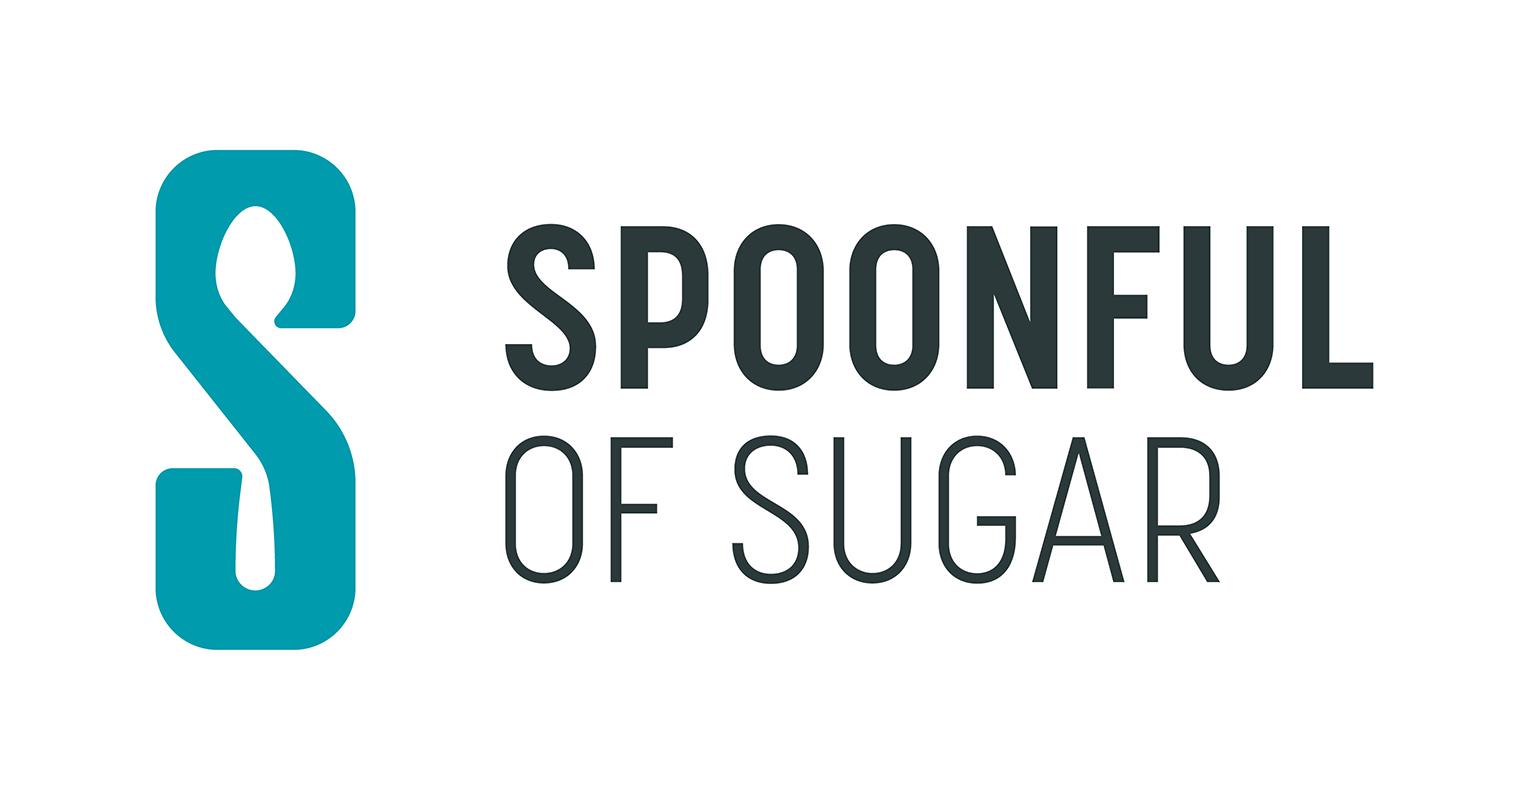 Spoonful of sugar logo